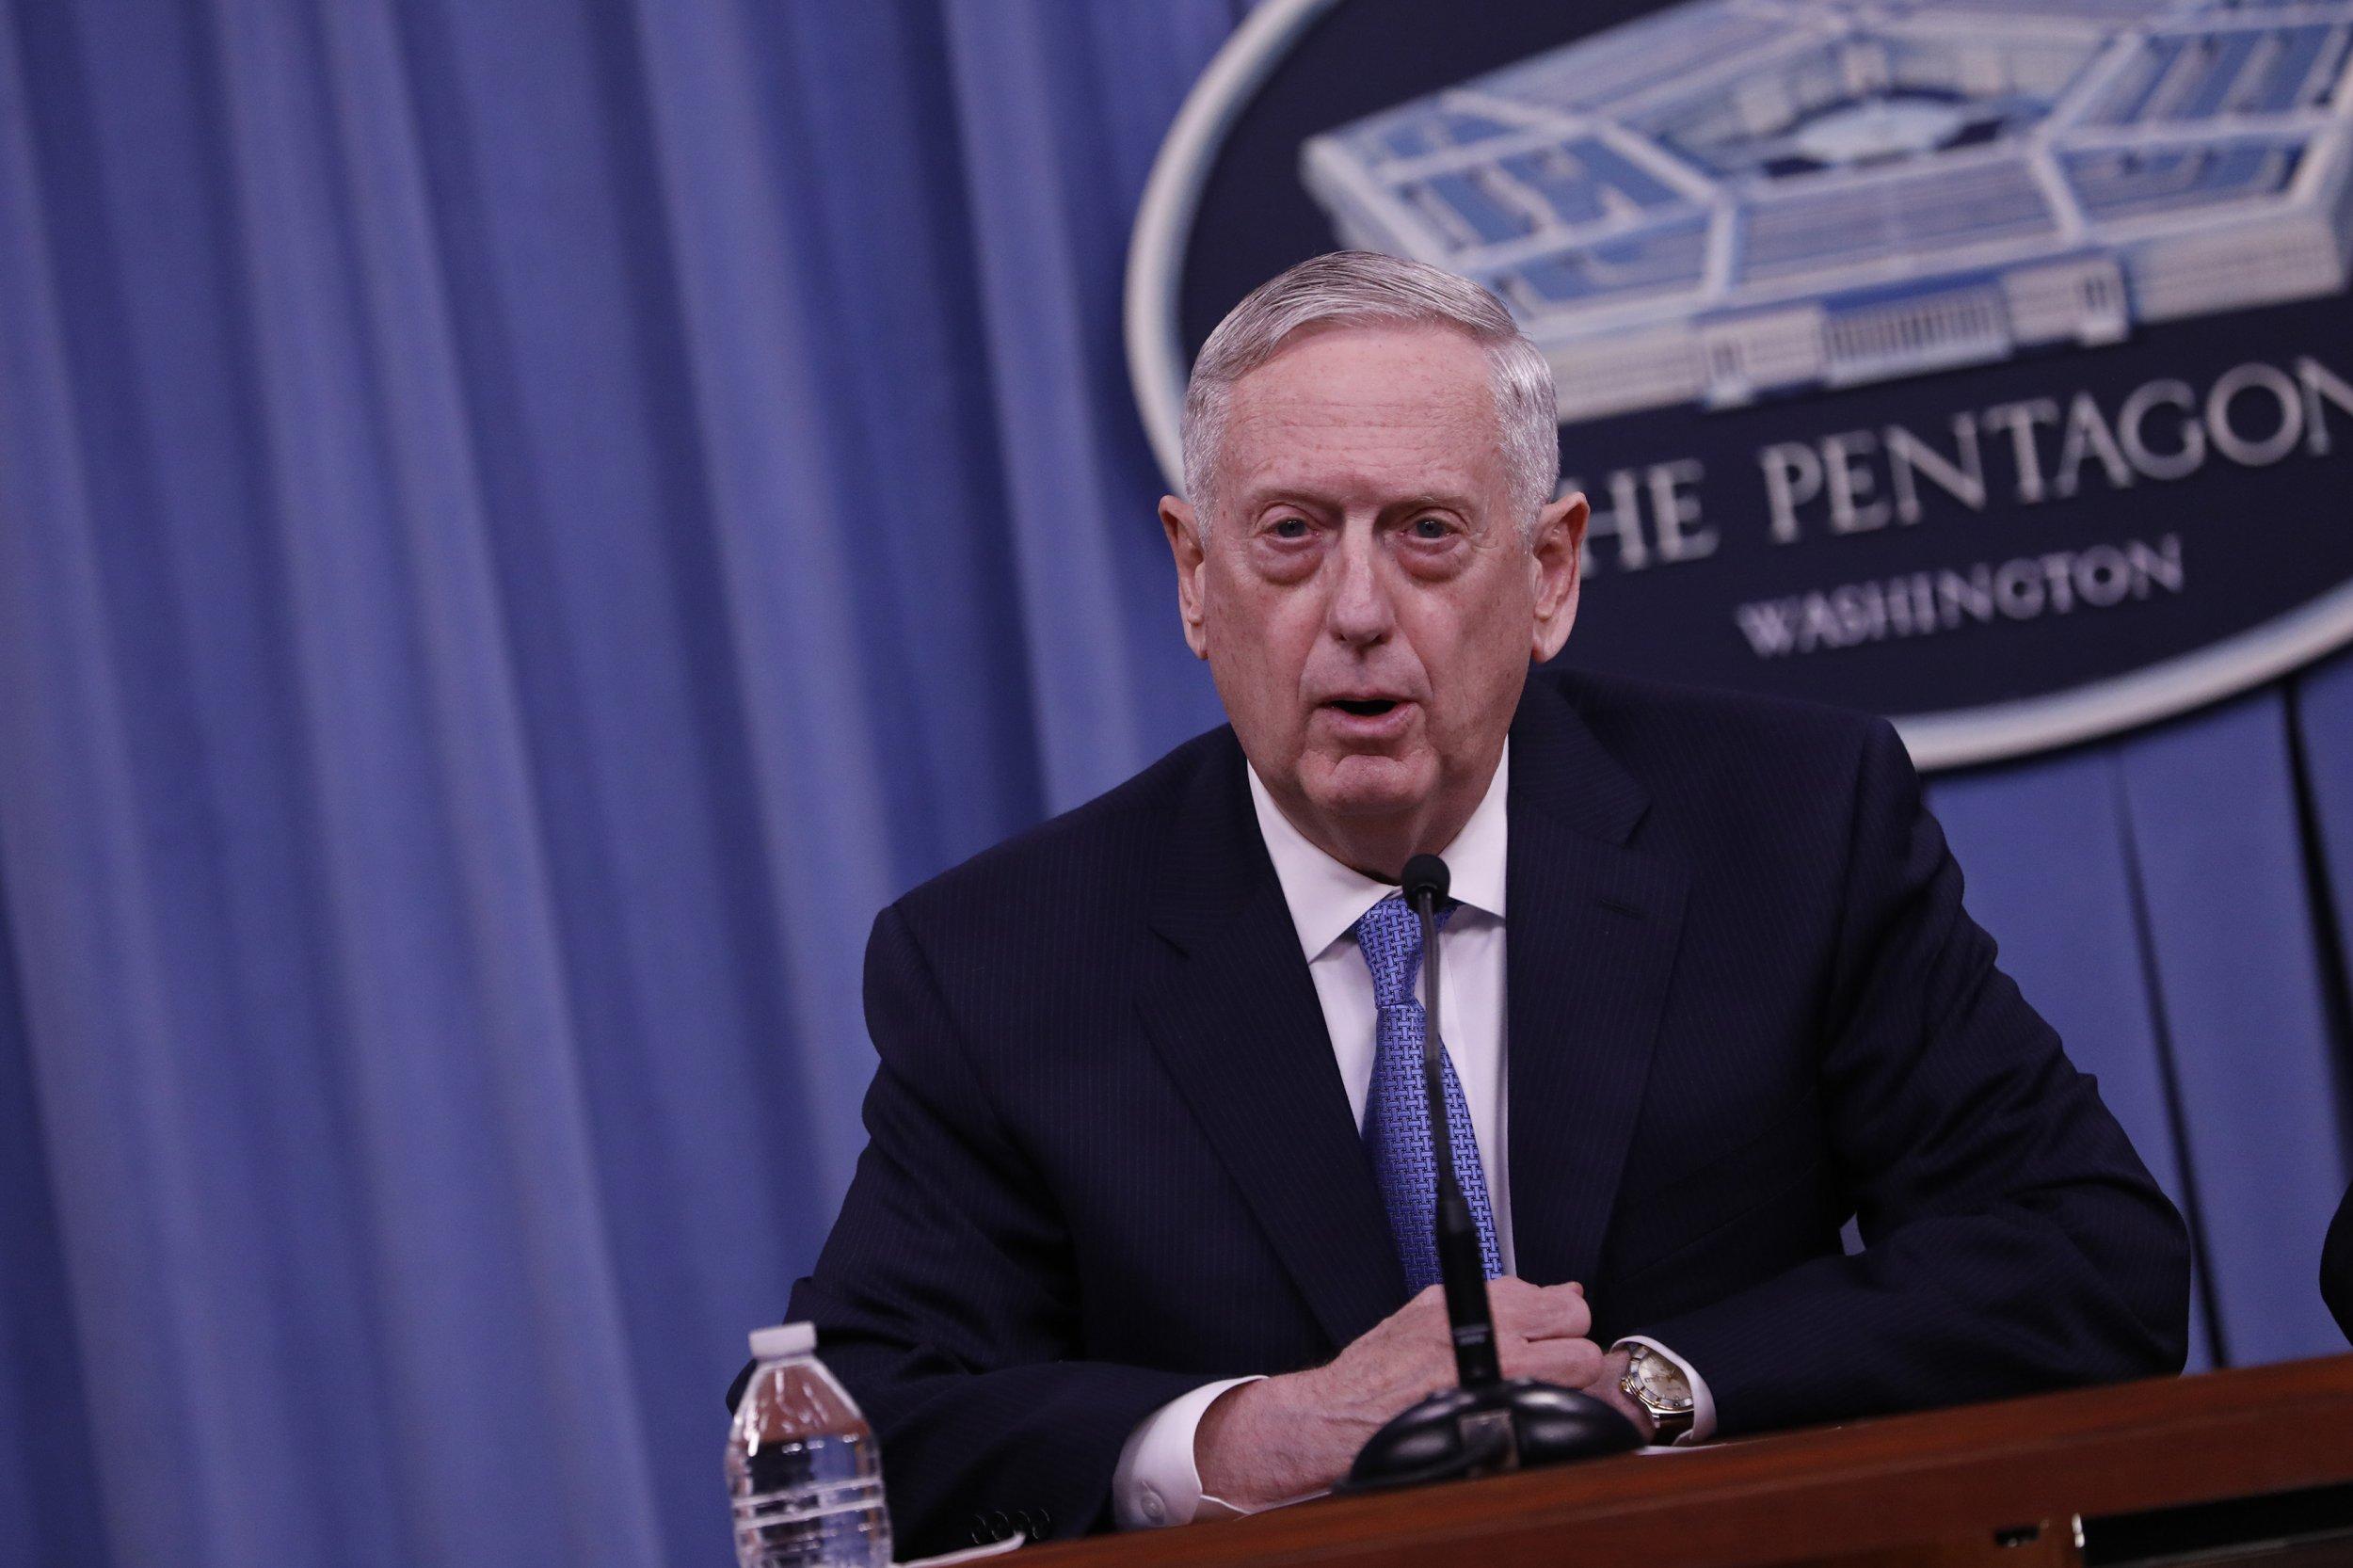 Did Mattis's threat to annihilate the Korean people go too far?